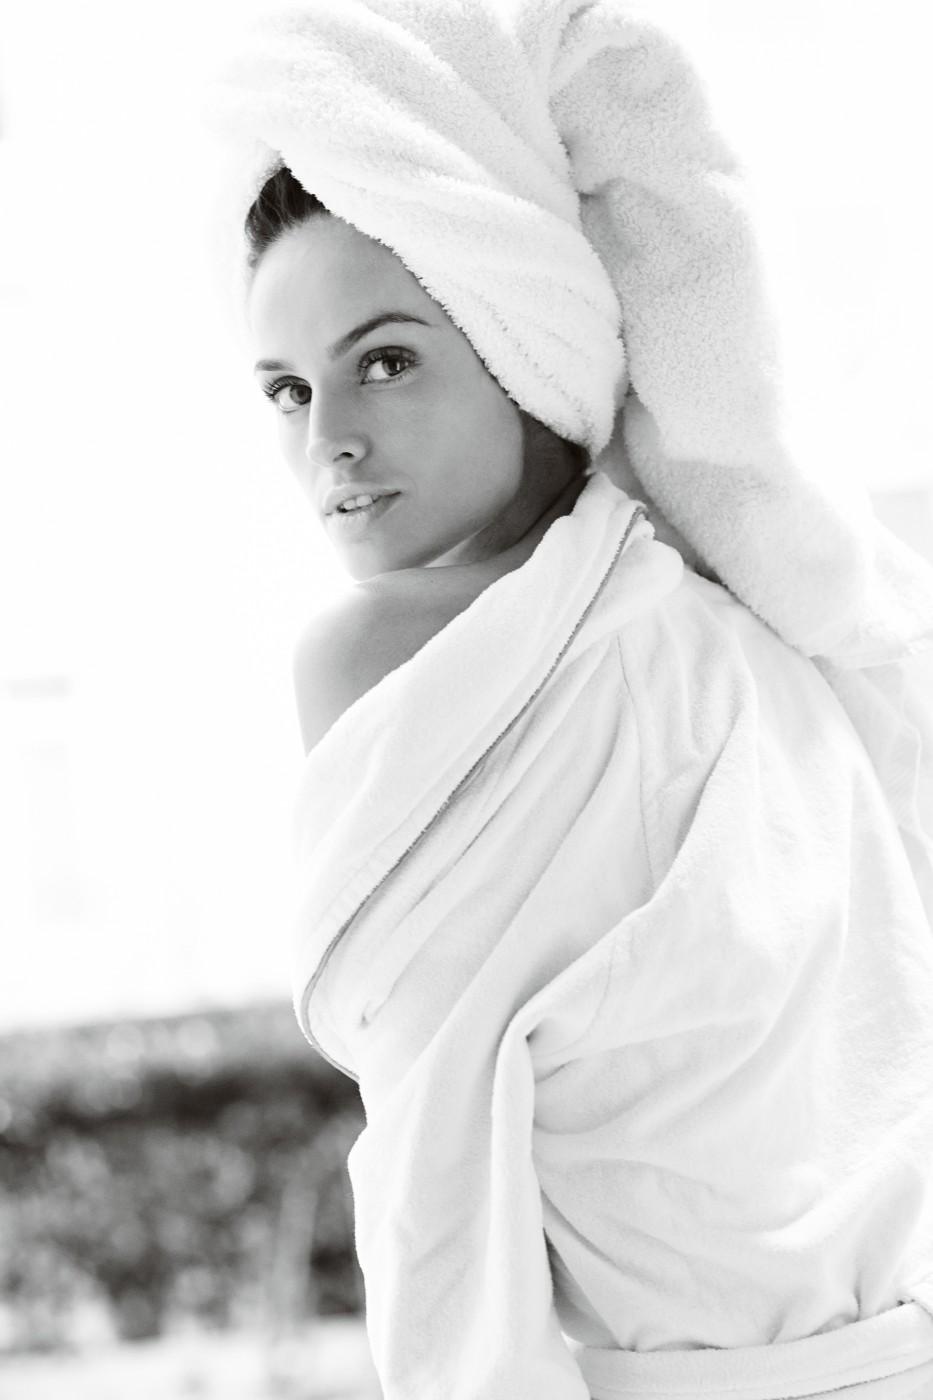 - Mario Testino, Towel Series 57. Izabel Goulart